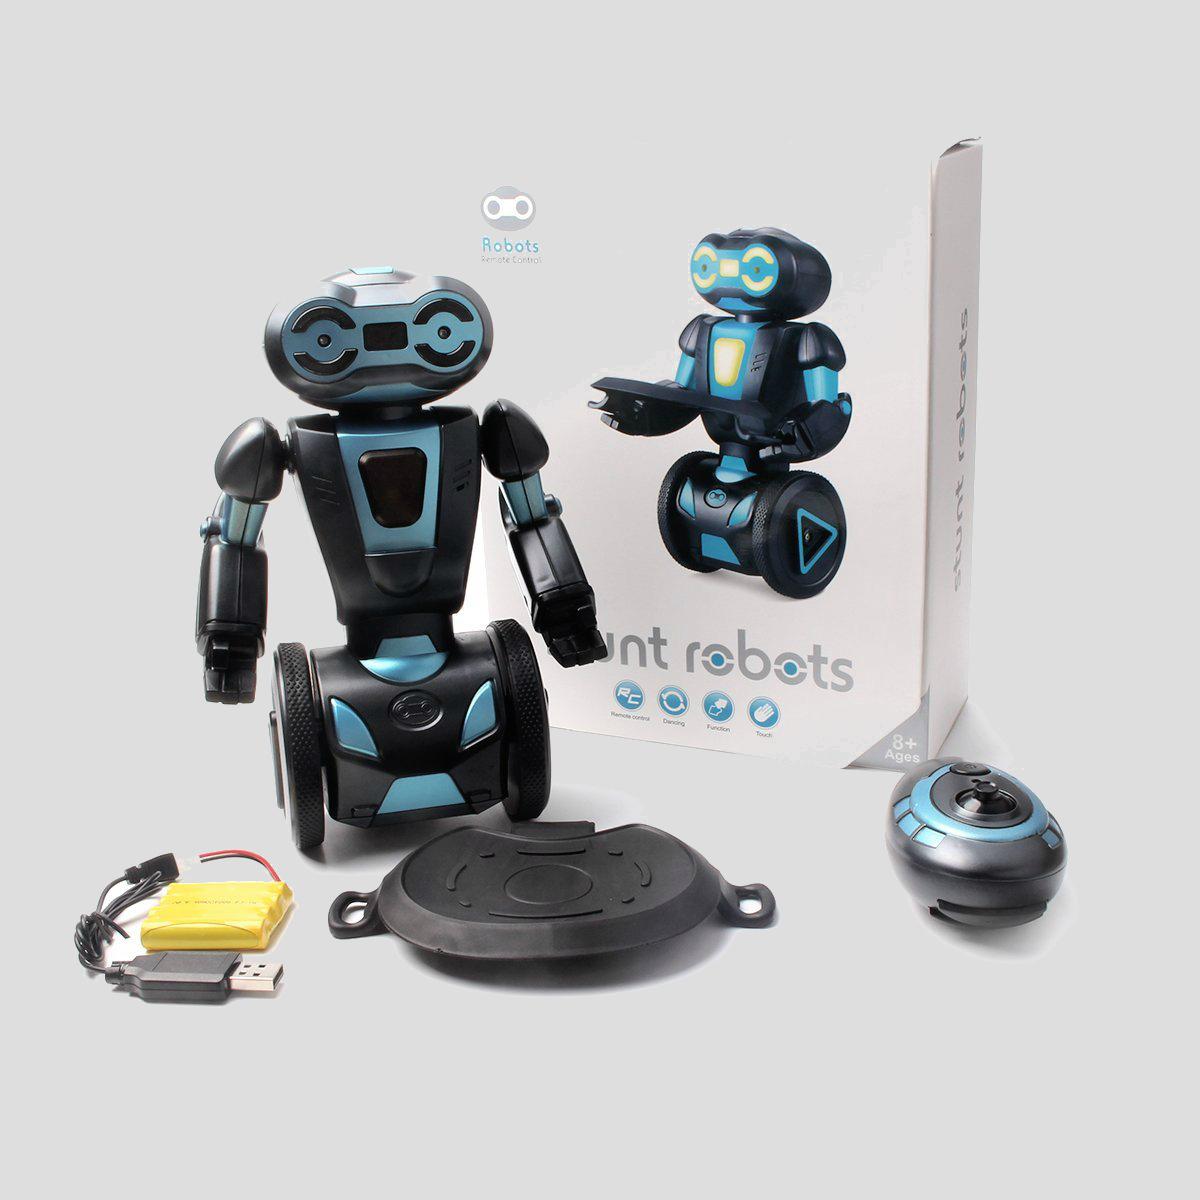 Fozela Intelligent Humanoid Robotic Remote Control Robot